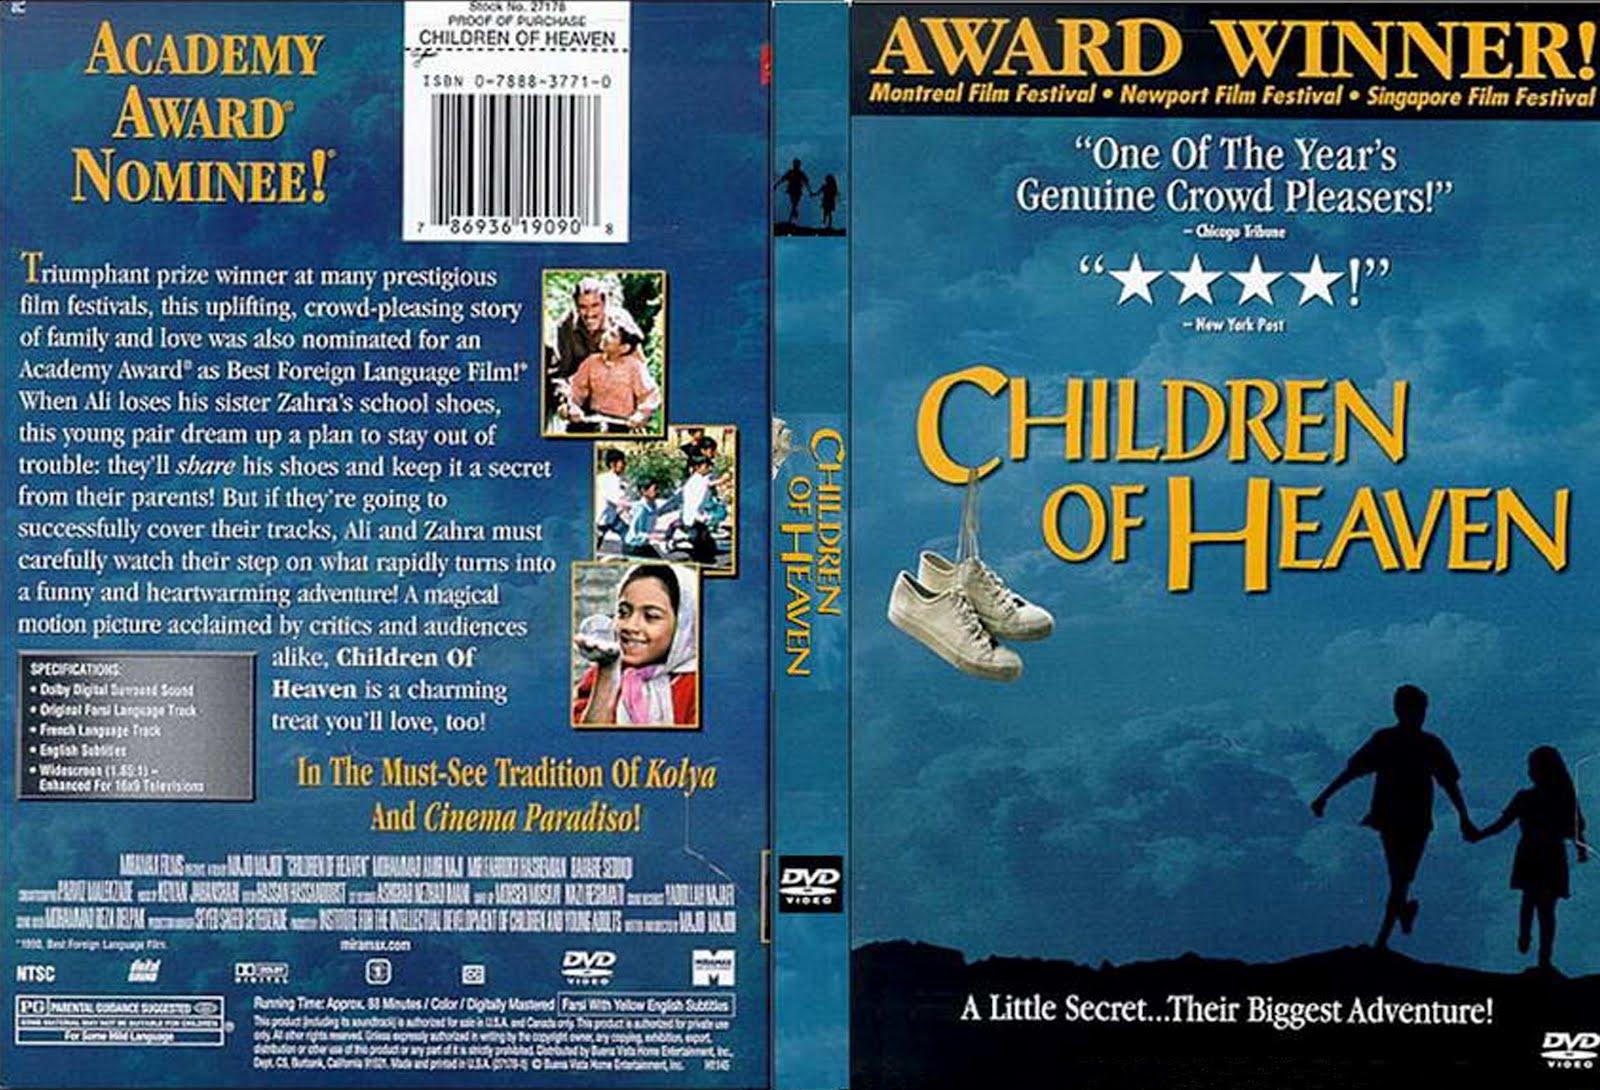 Children of Heaven Dvd Front Cover